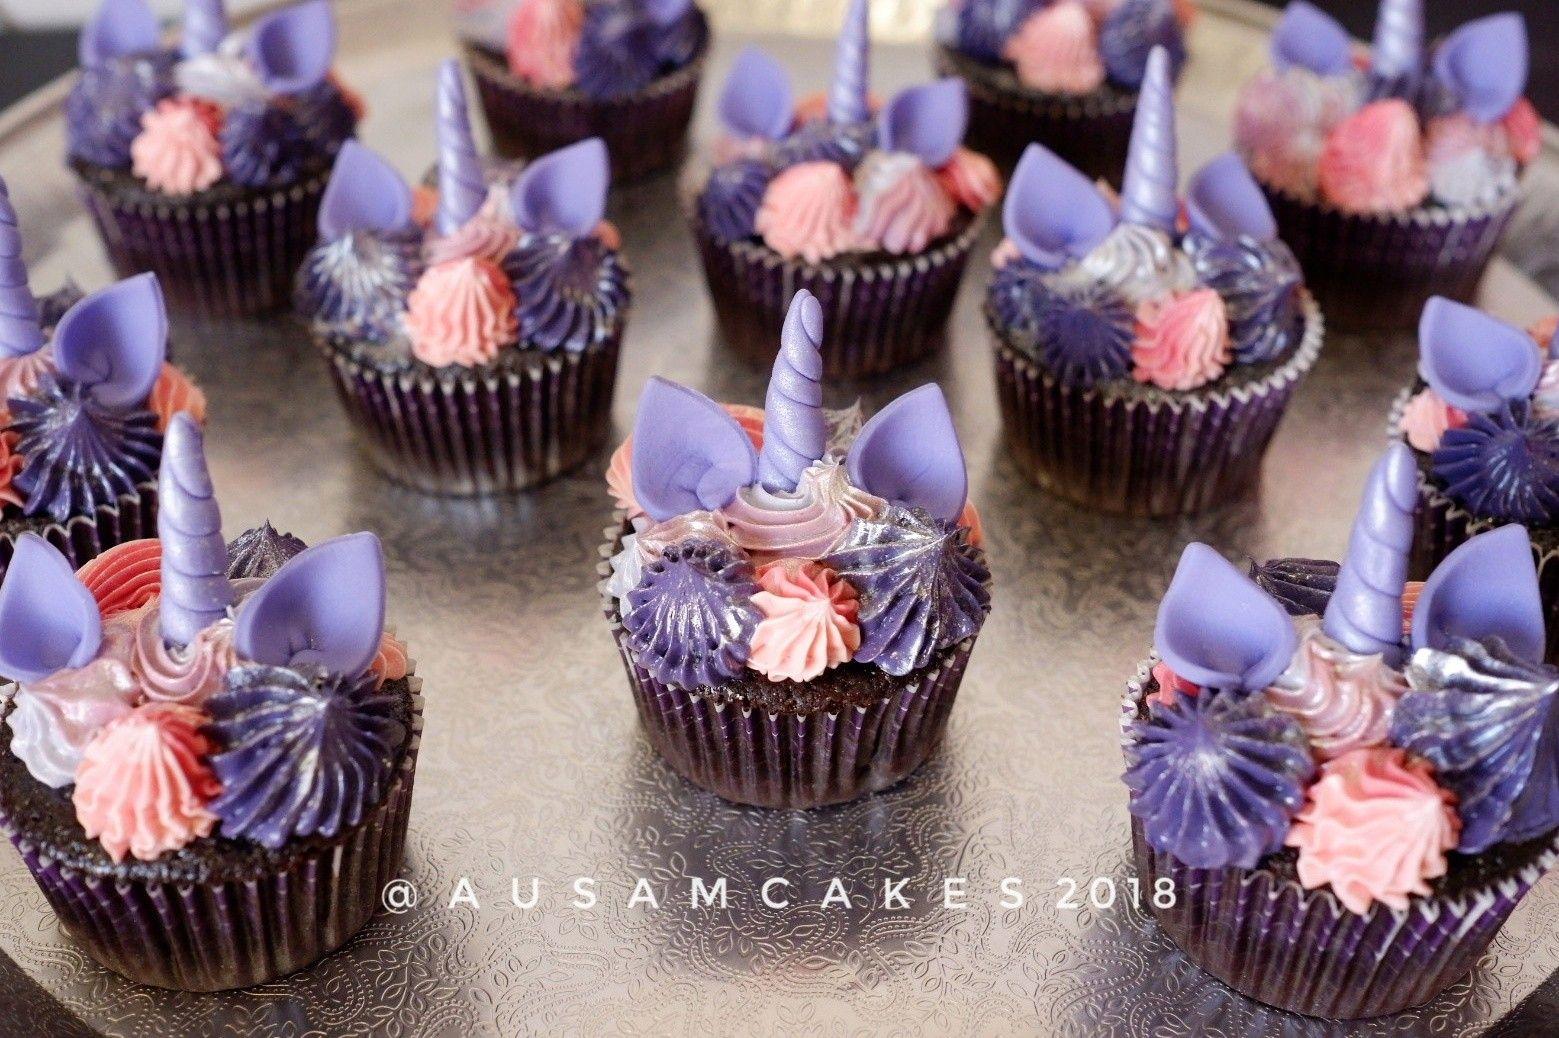 My Little Pony Twilight Sparkles Cupcakes